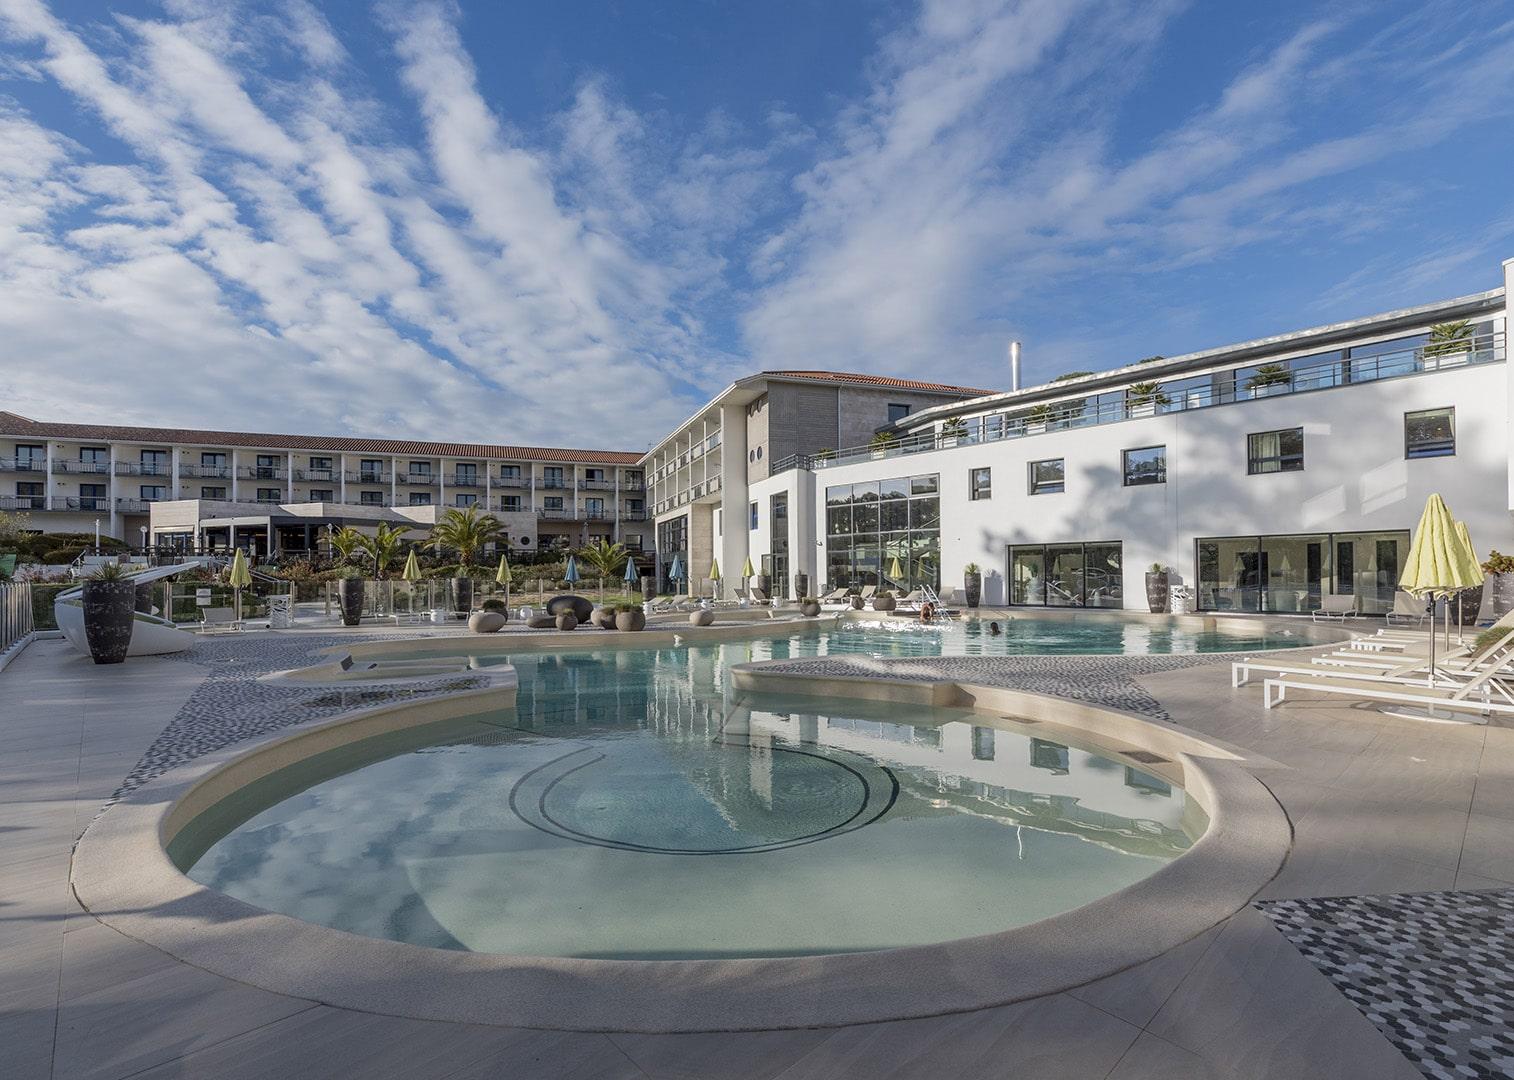 hotel-les-bains-darguin-arcachon-robinson-hotellerie2